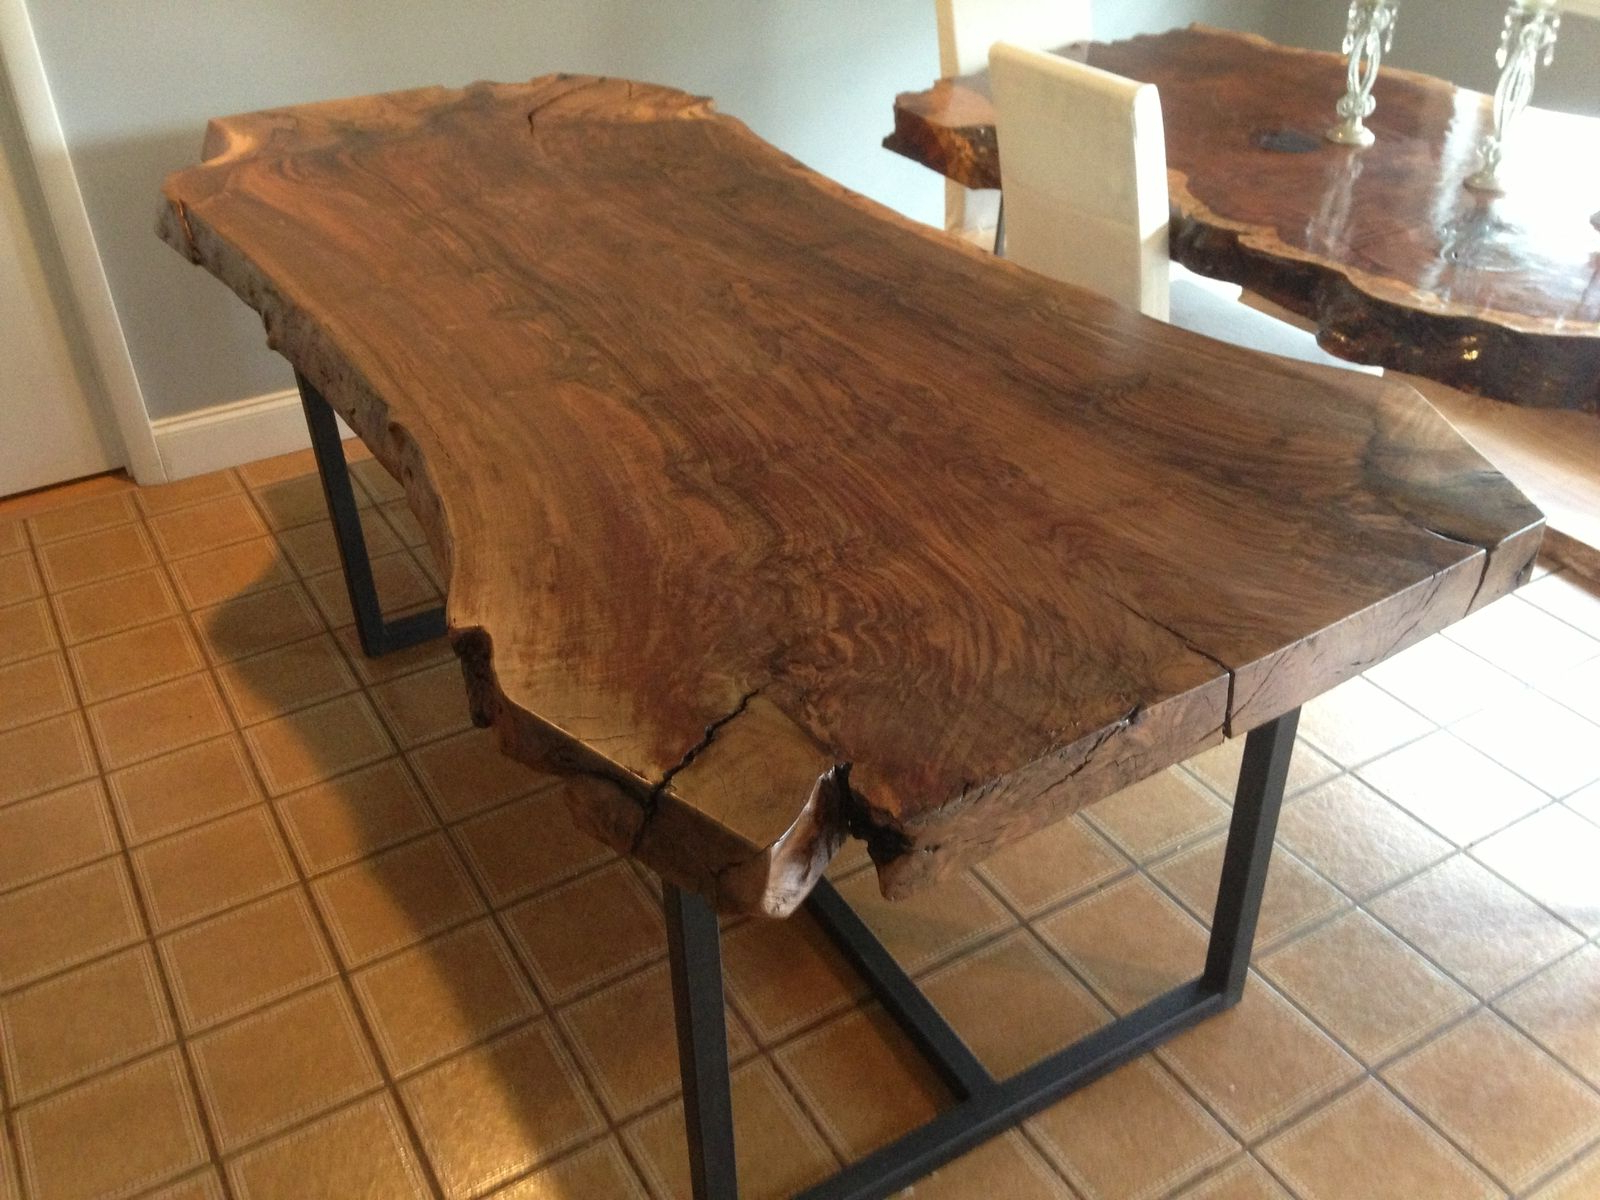 Popular Handmade Live Edge Claro Walnut Dining Tableozma Design With Walnut Finish Live Edge Wood Contemporary Dining Tables (View 16 of 25)